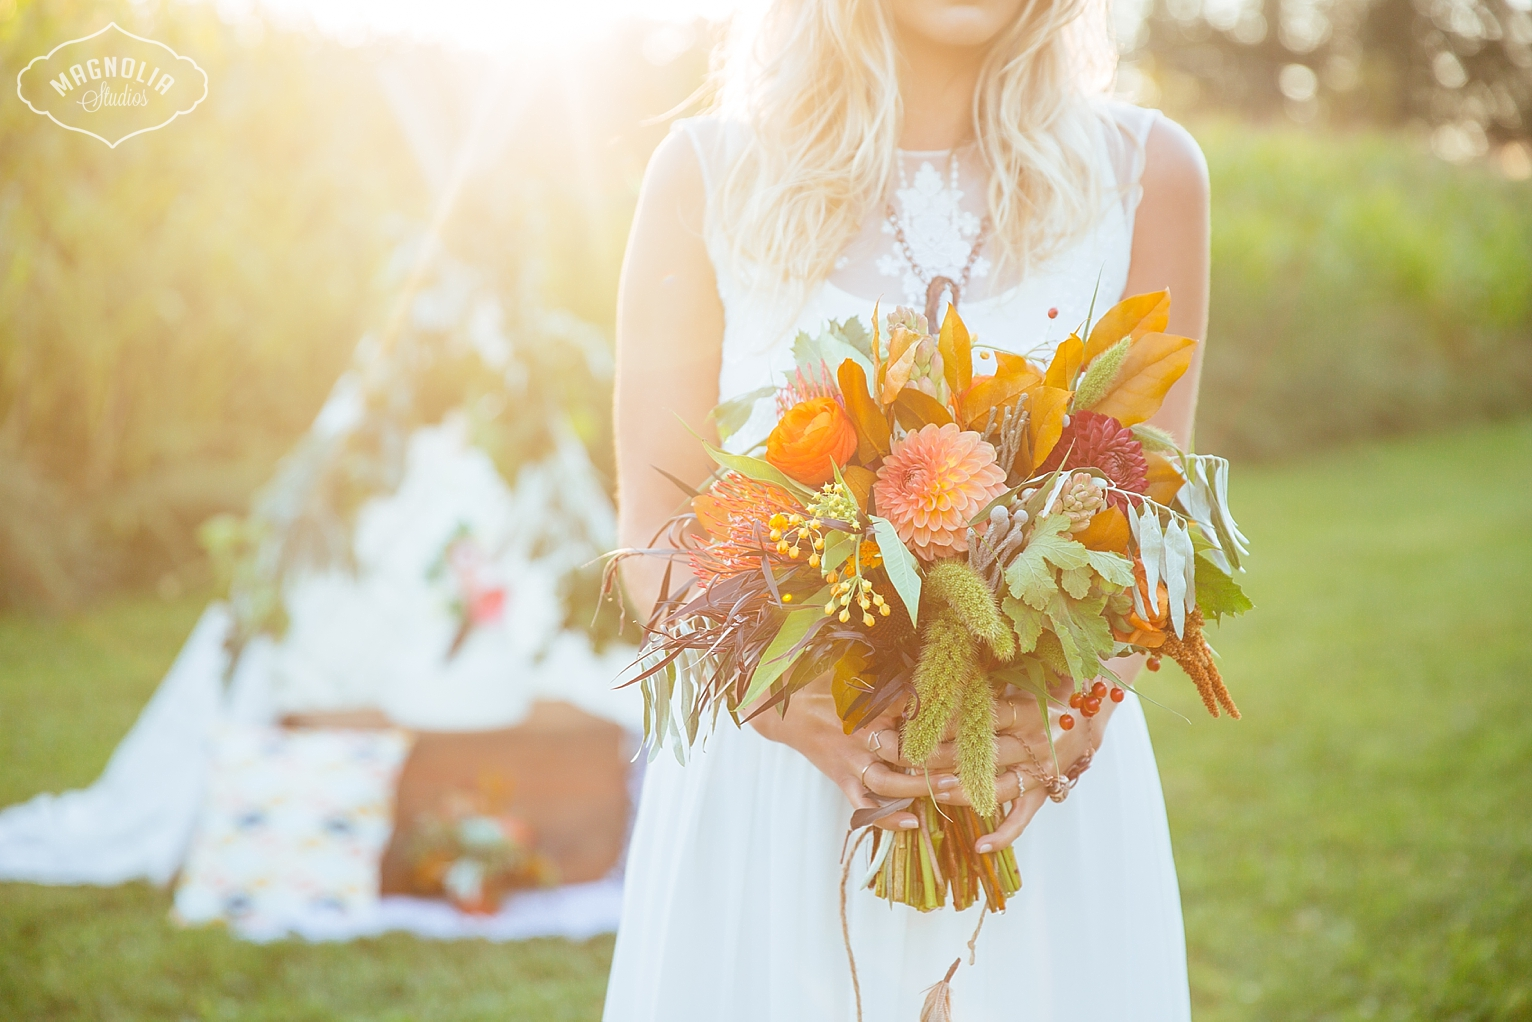 bohemian bride, boho style for weddings